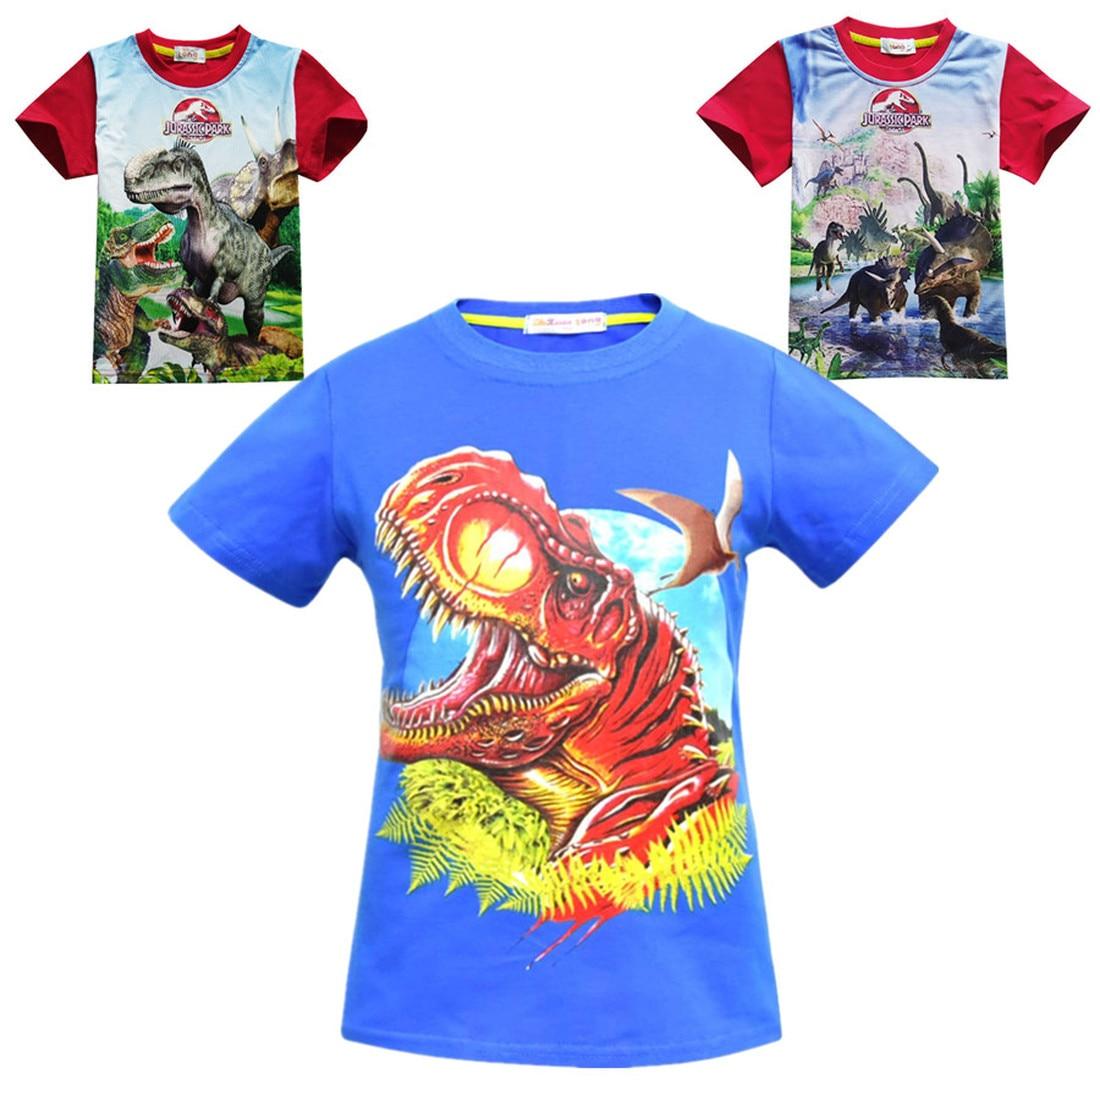 3943e7e2 Jurassic World dinosaur children boys cotton t shirt summer Autumn baby  gilrs kids Hoodie tops tee for boy print clothes costume - aliexpress.com -  imall. ...